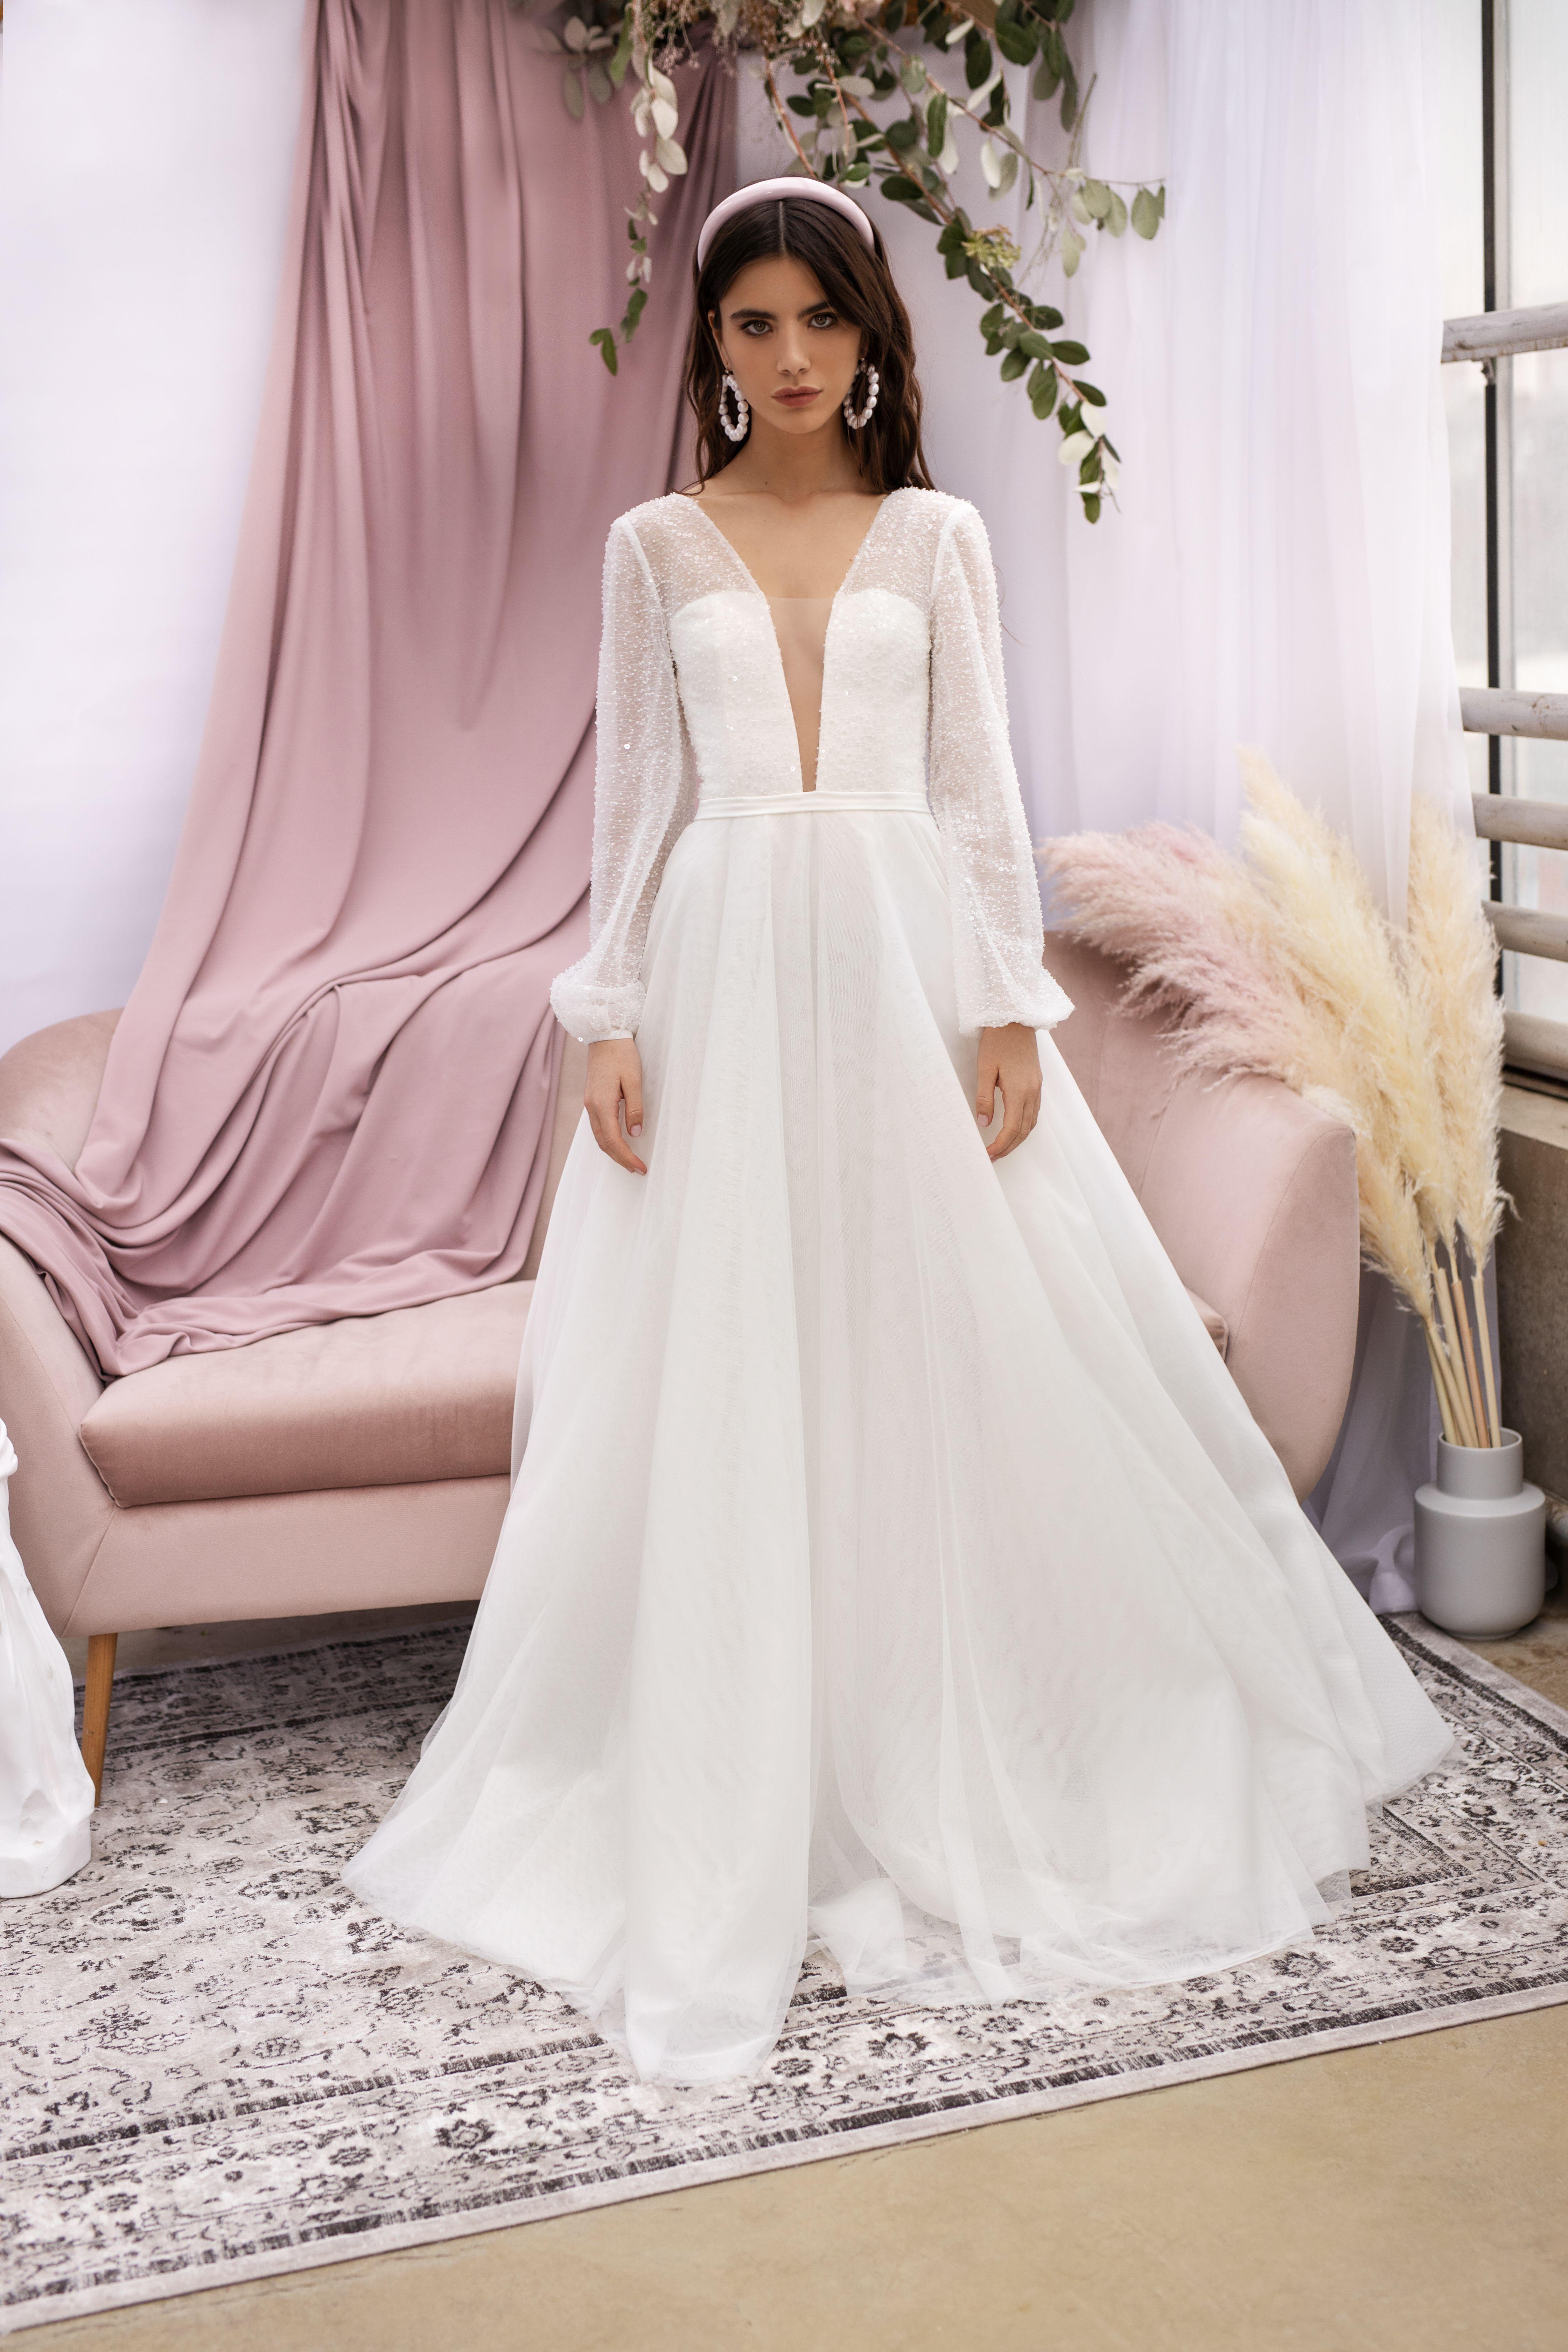 Mesh Bridal Gown With Deep V Neck By Dream Dress Long Sleeves Wedding Dress Bohemian Wedding A M Etsy Wedding Dress Flattering Wedding Dress Wedding Dresses [ 6720 x 4480 Pixel ]